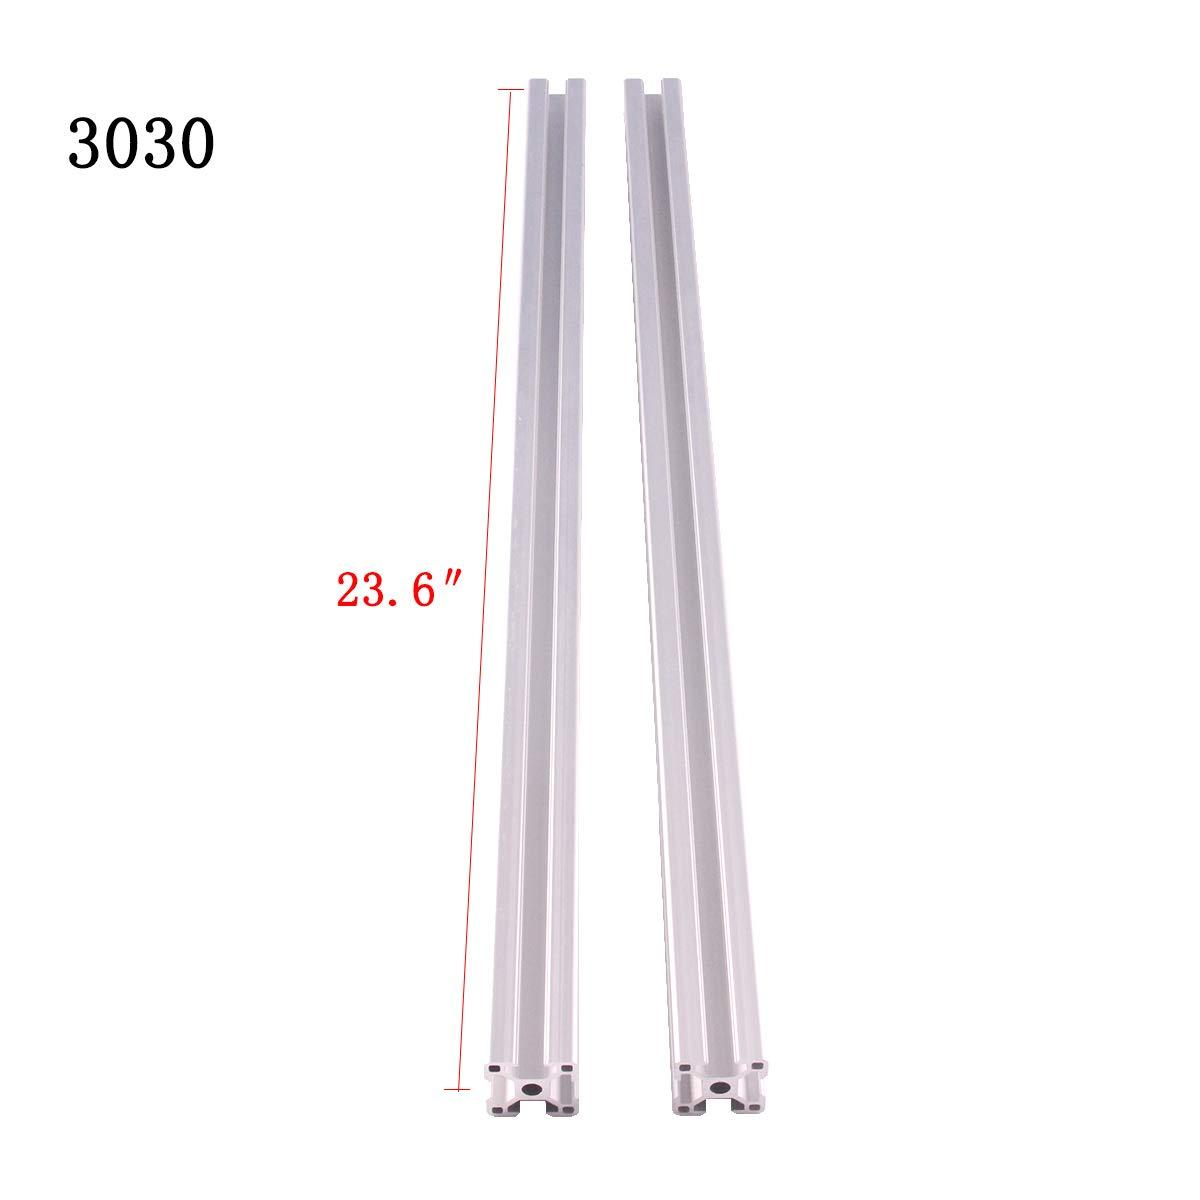 39.4 inch 2Pcs 3030 Extrusion European Standard Anodized Linear Rail Length 1000mm Linear Rail Standard 8mm T Slot for 3D Printer Workbench